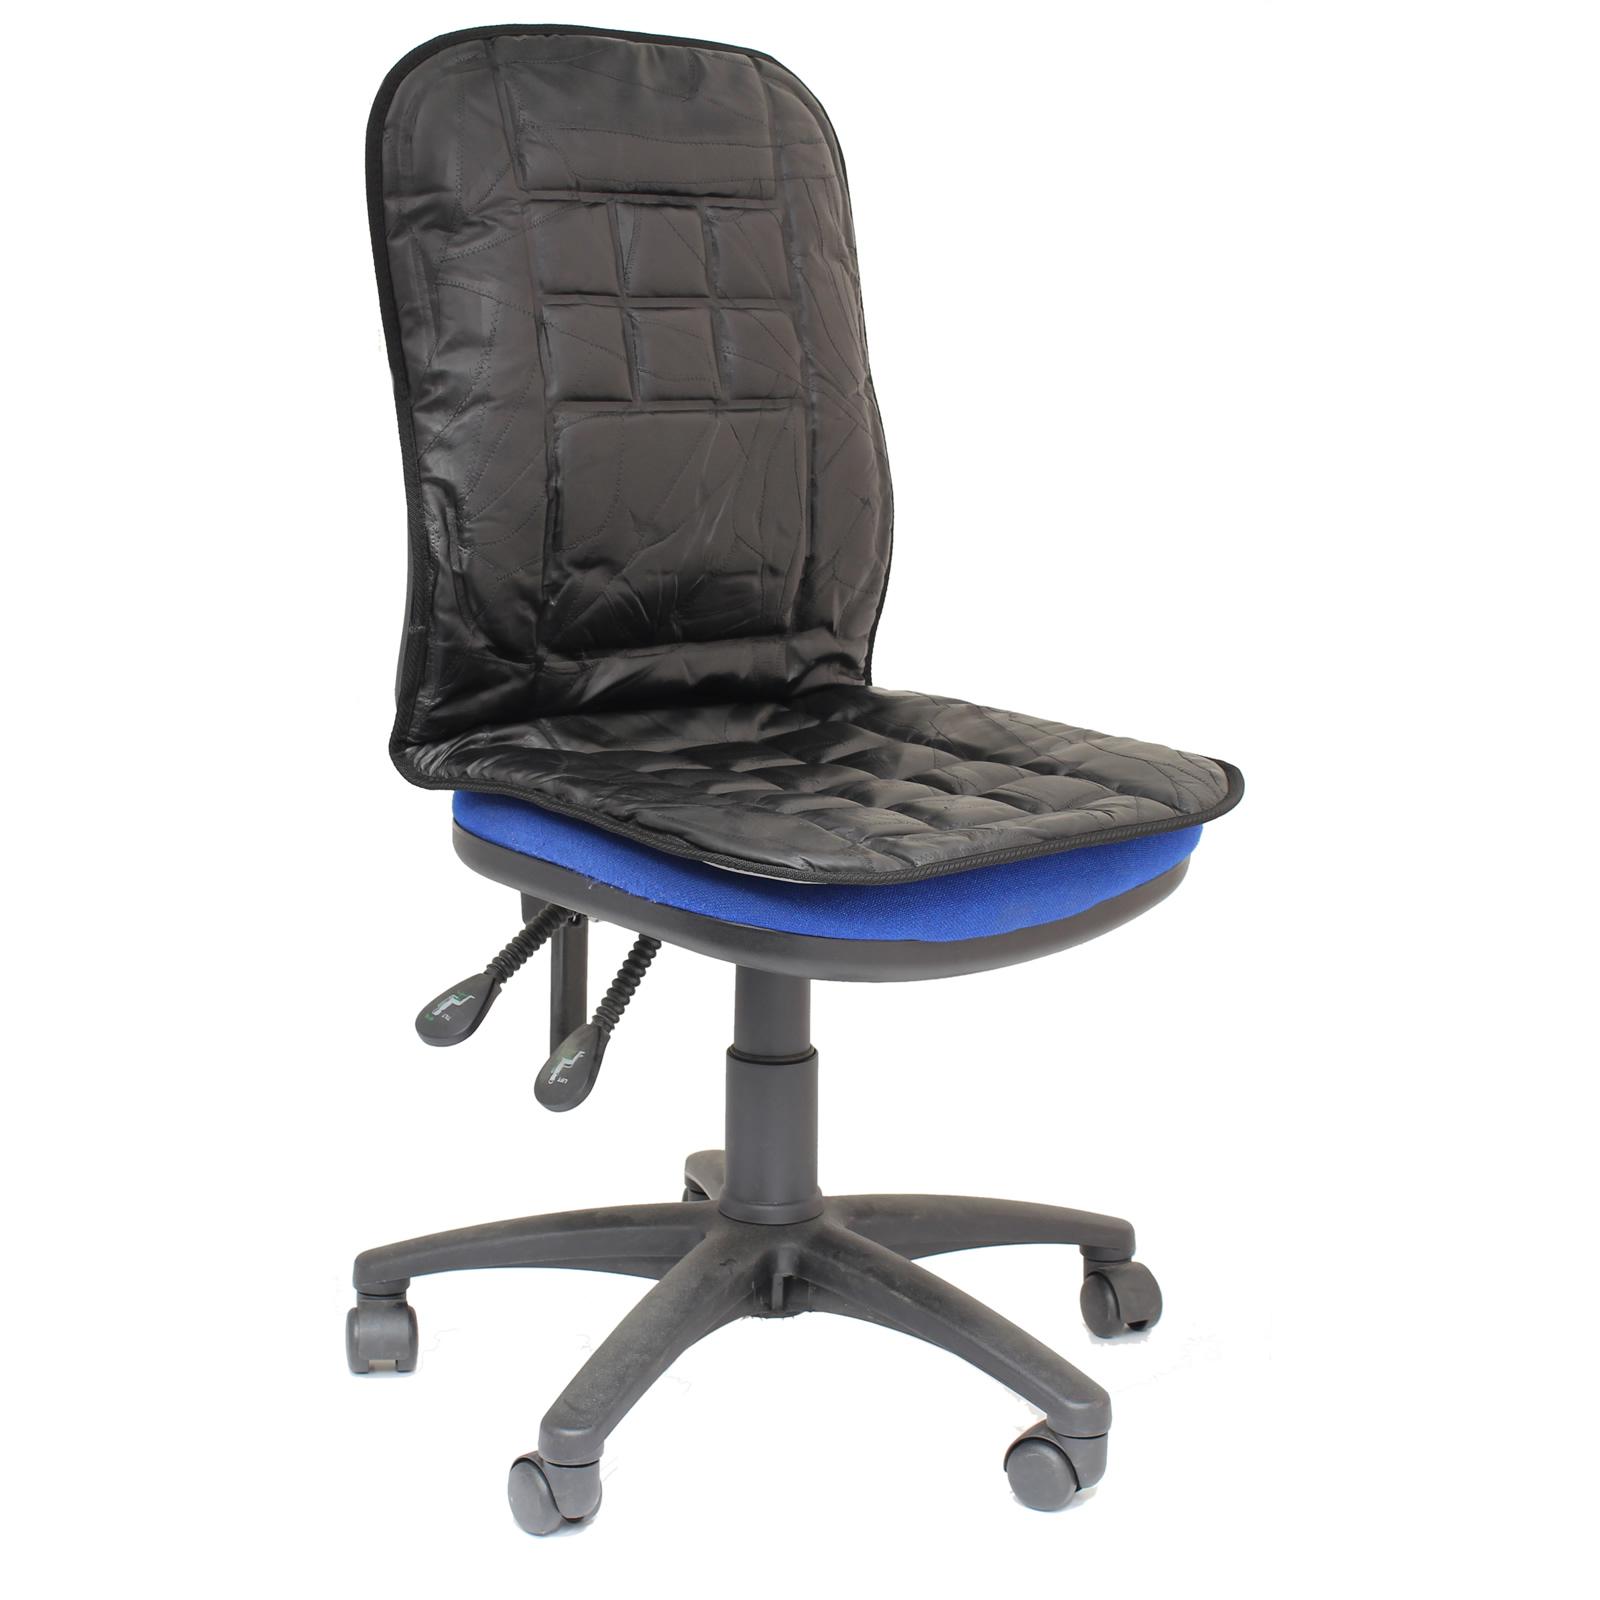 cushion for office chair